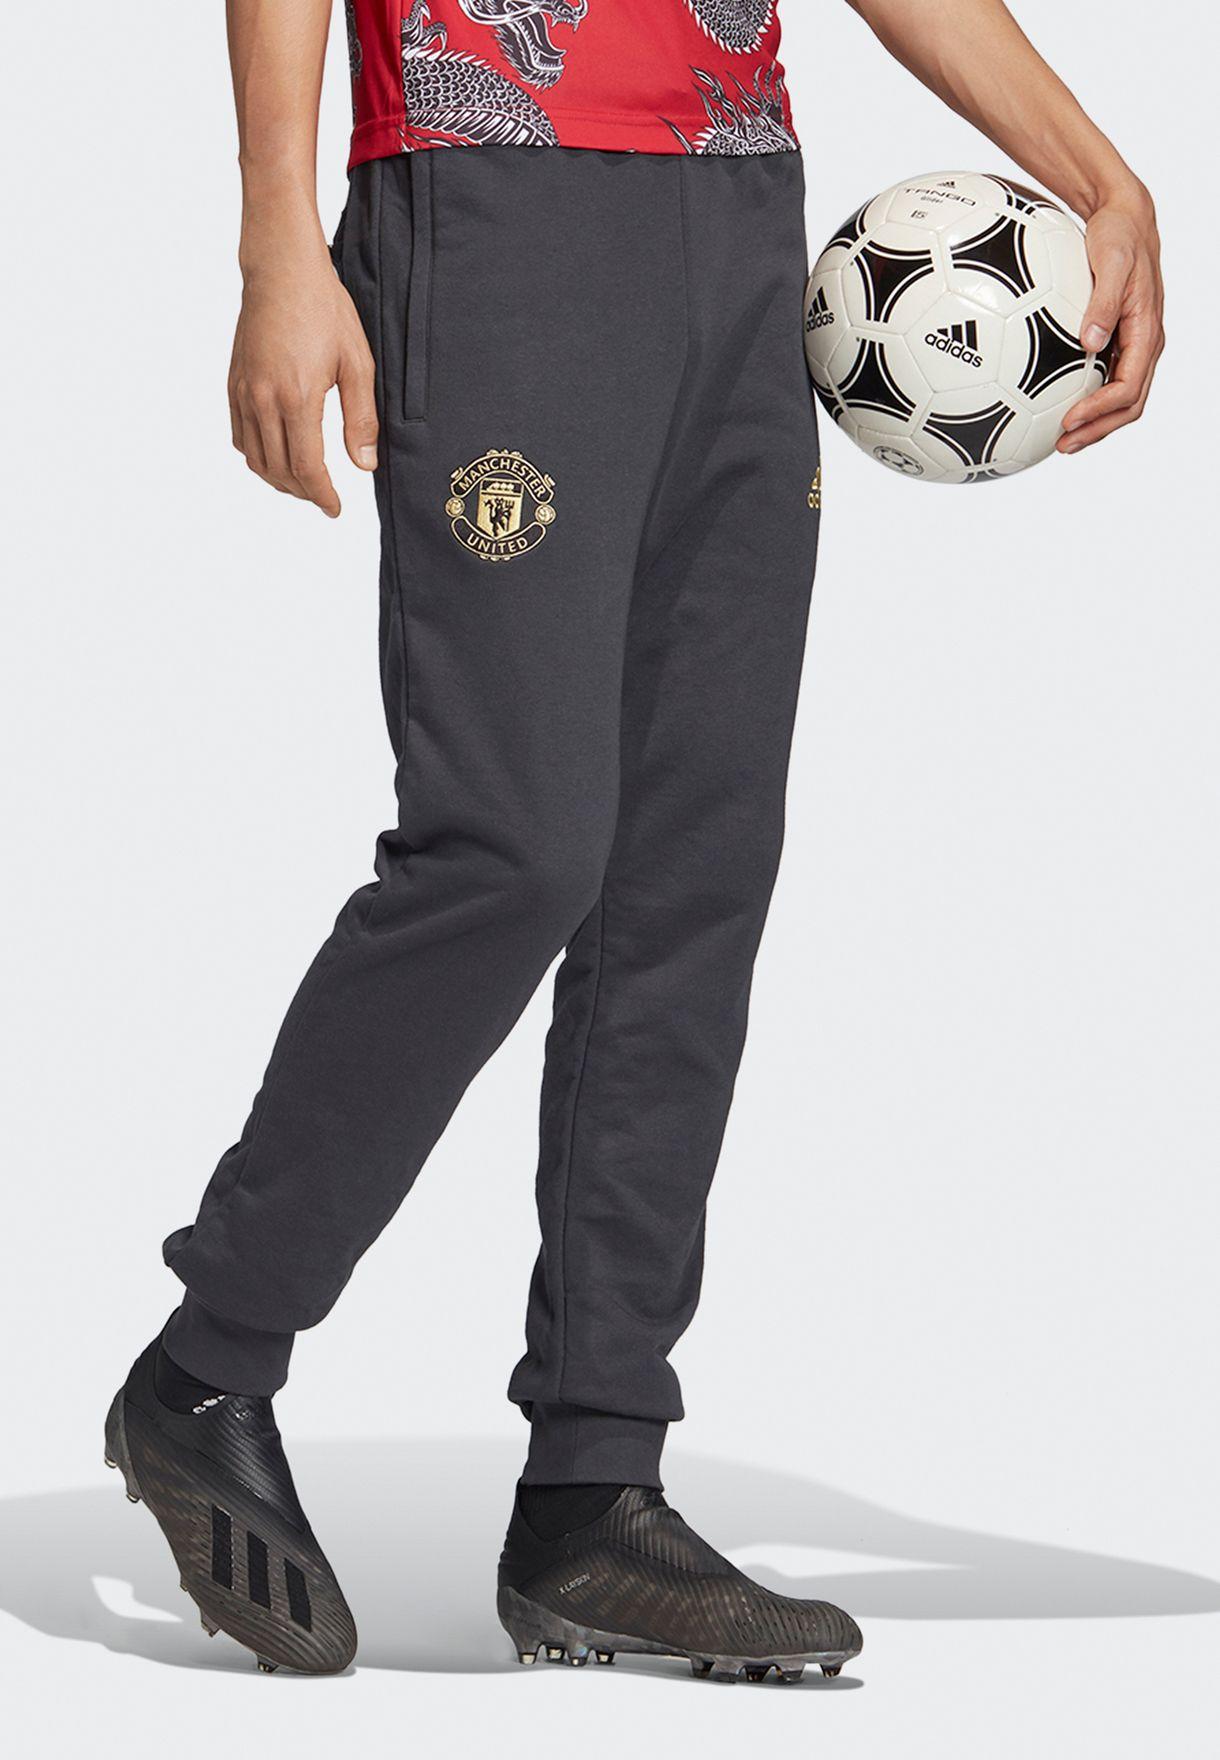 Manchester United CNY Sweatpants